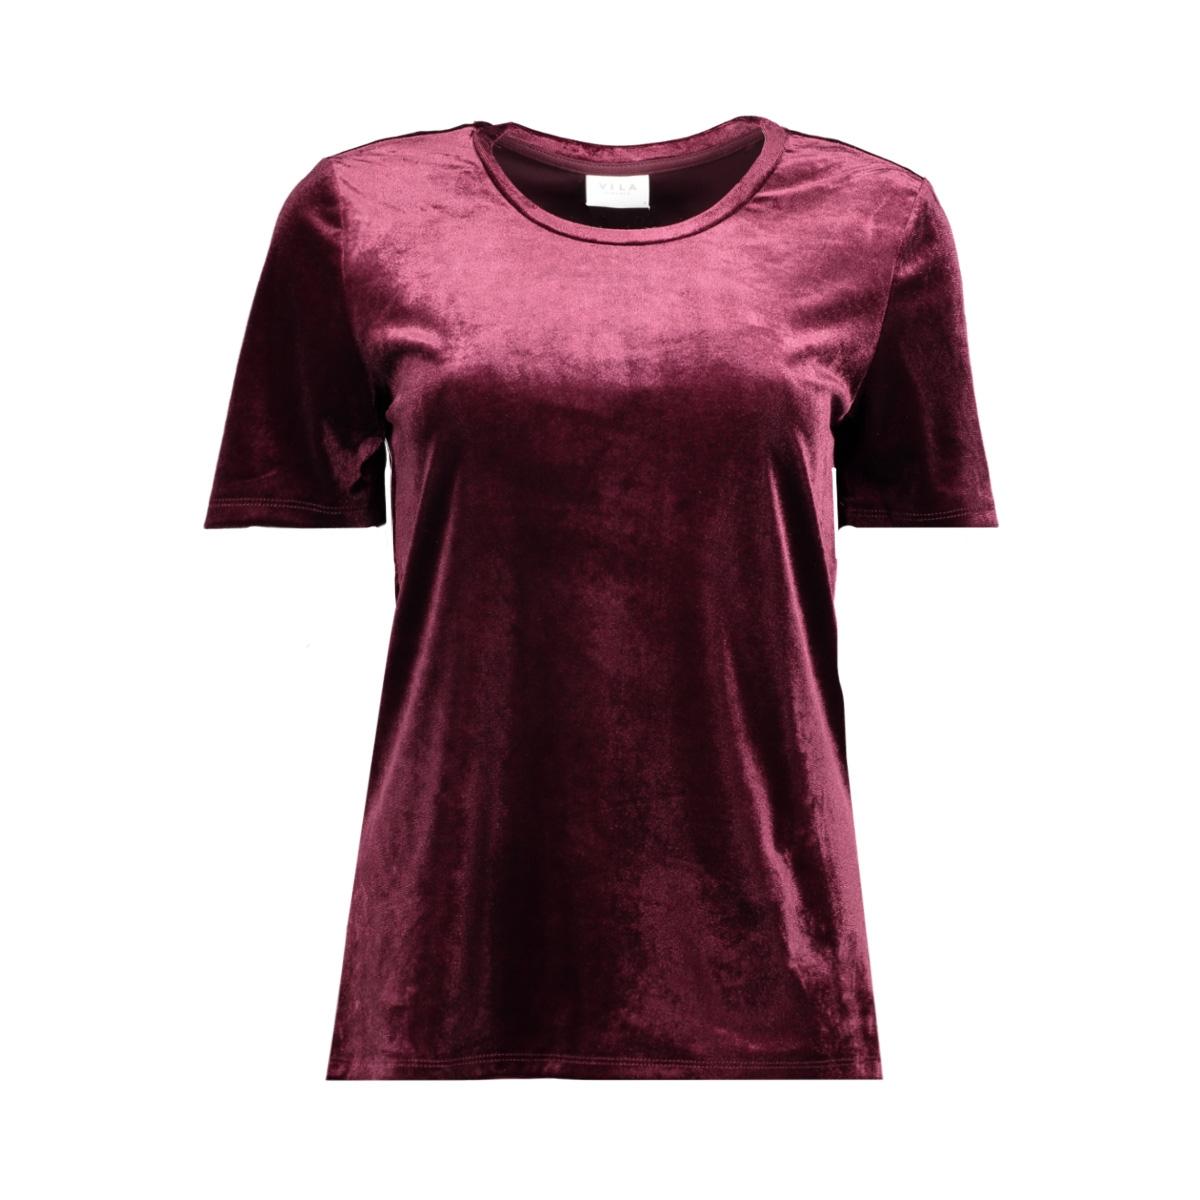 visienna s/s top 14045189 vila t-shirt fig